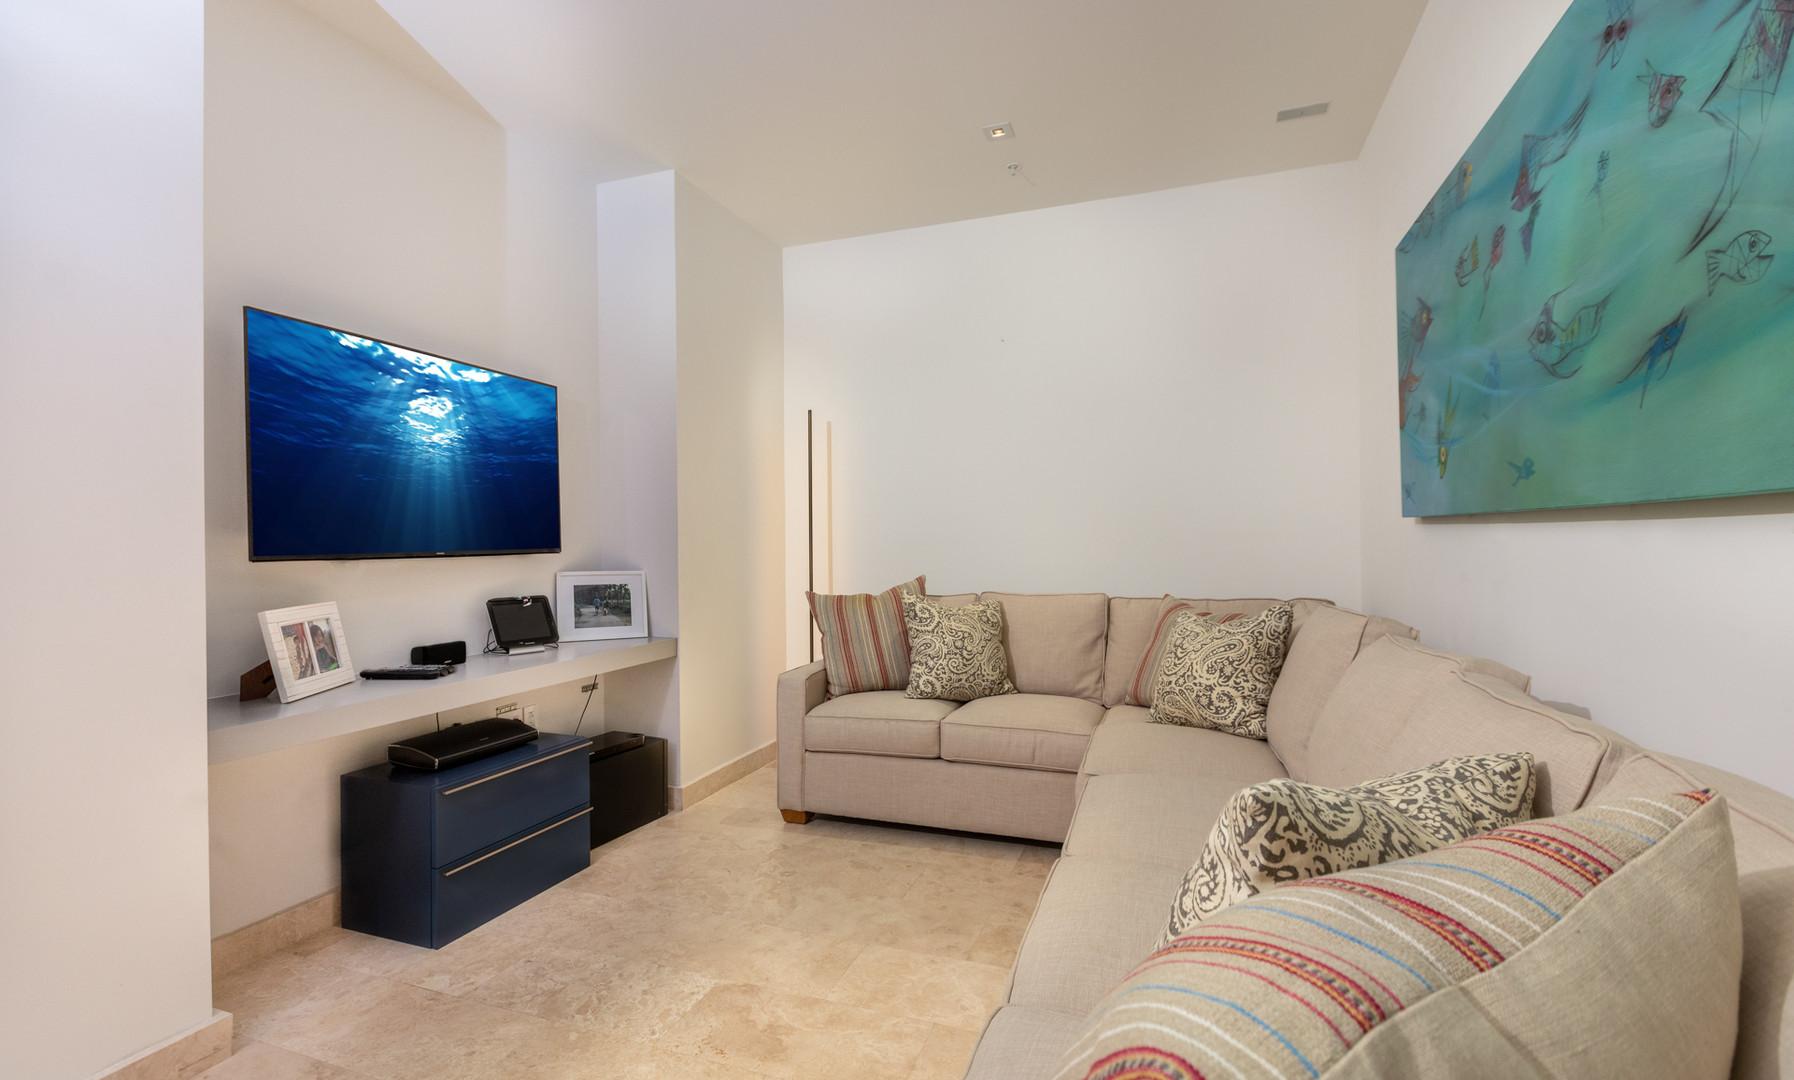 West Beach - Soundproof Media Room